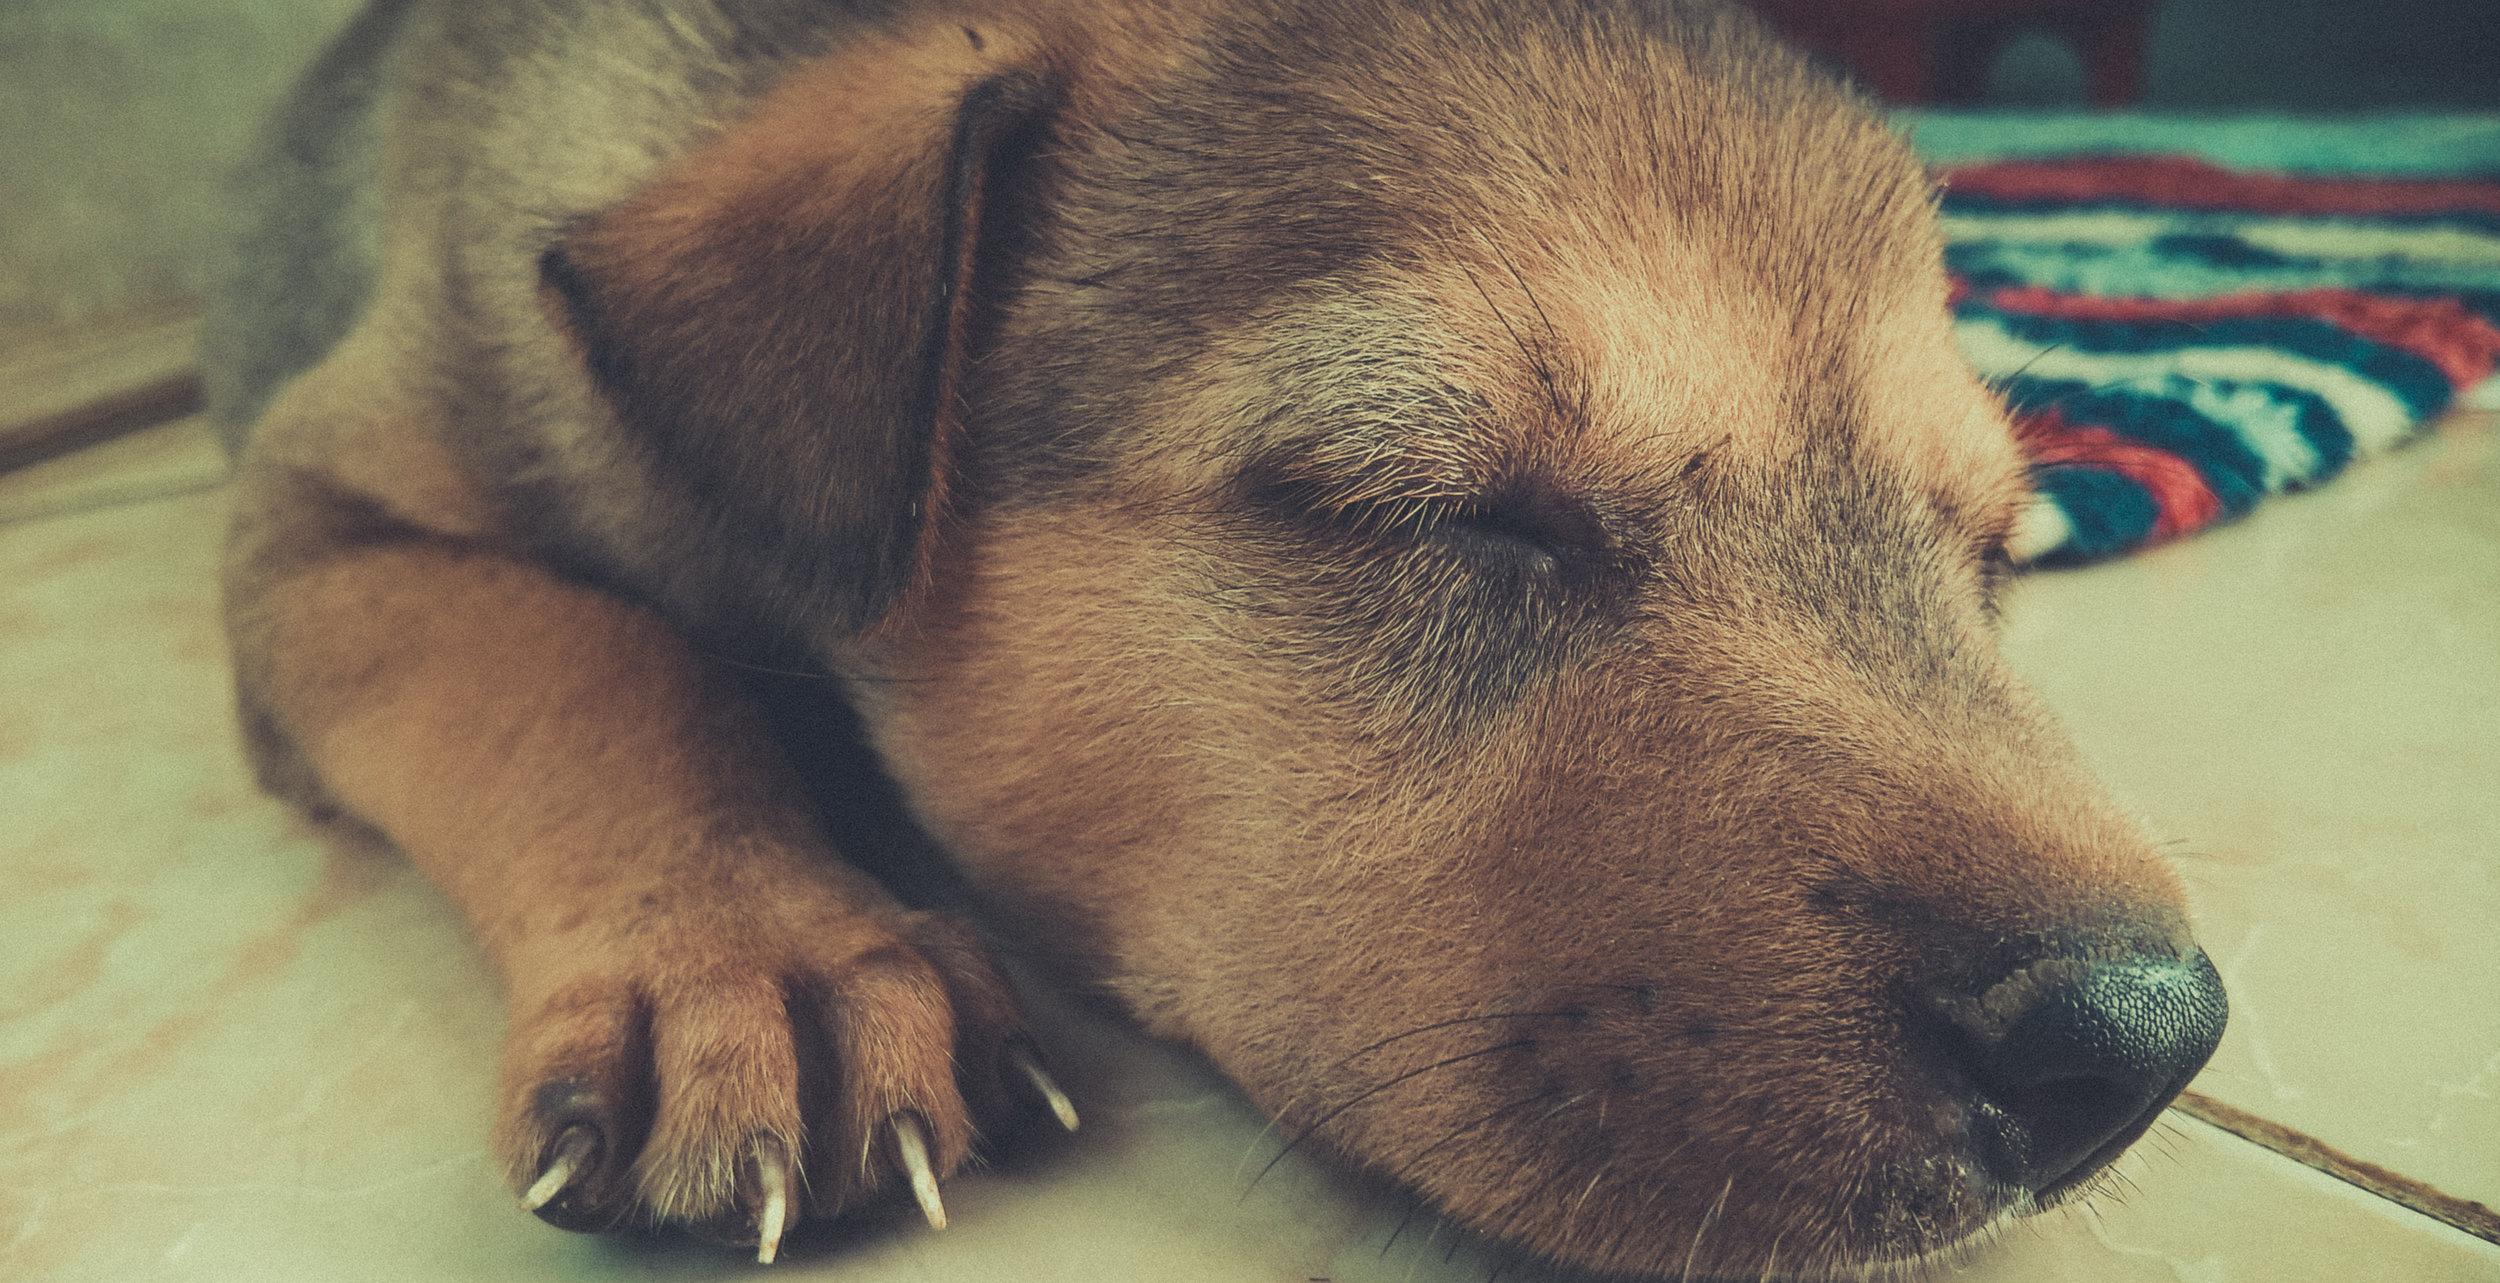 puppy sleeping.jpeg